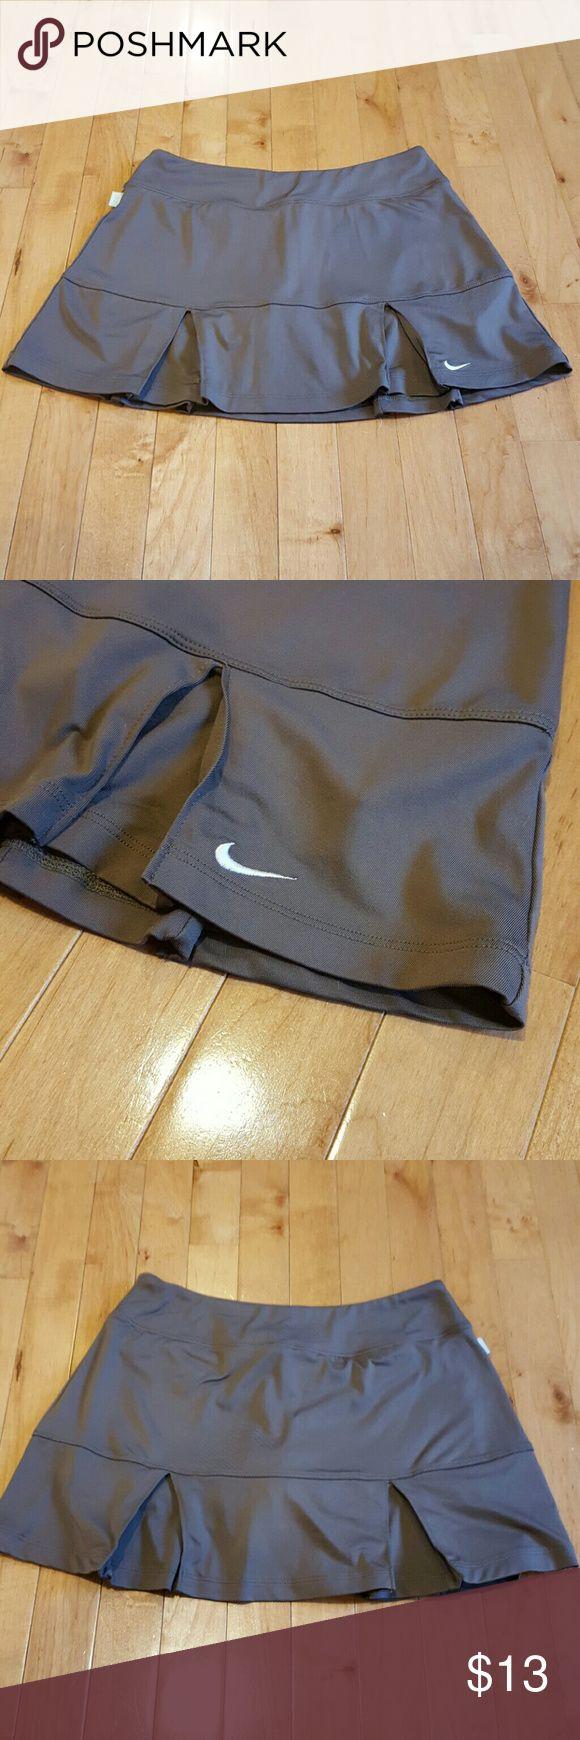 Nike Tennis Skort Dri-fir gray Nike tennis skort. Perfect condition, never worn! Nike Shorts Skorts